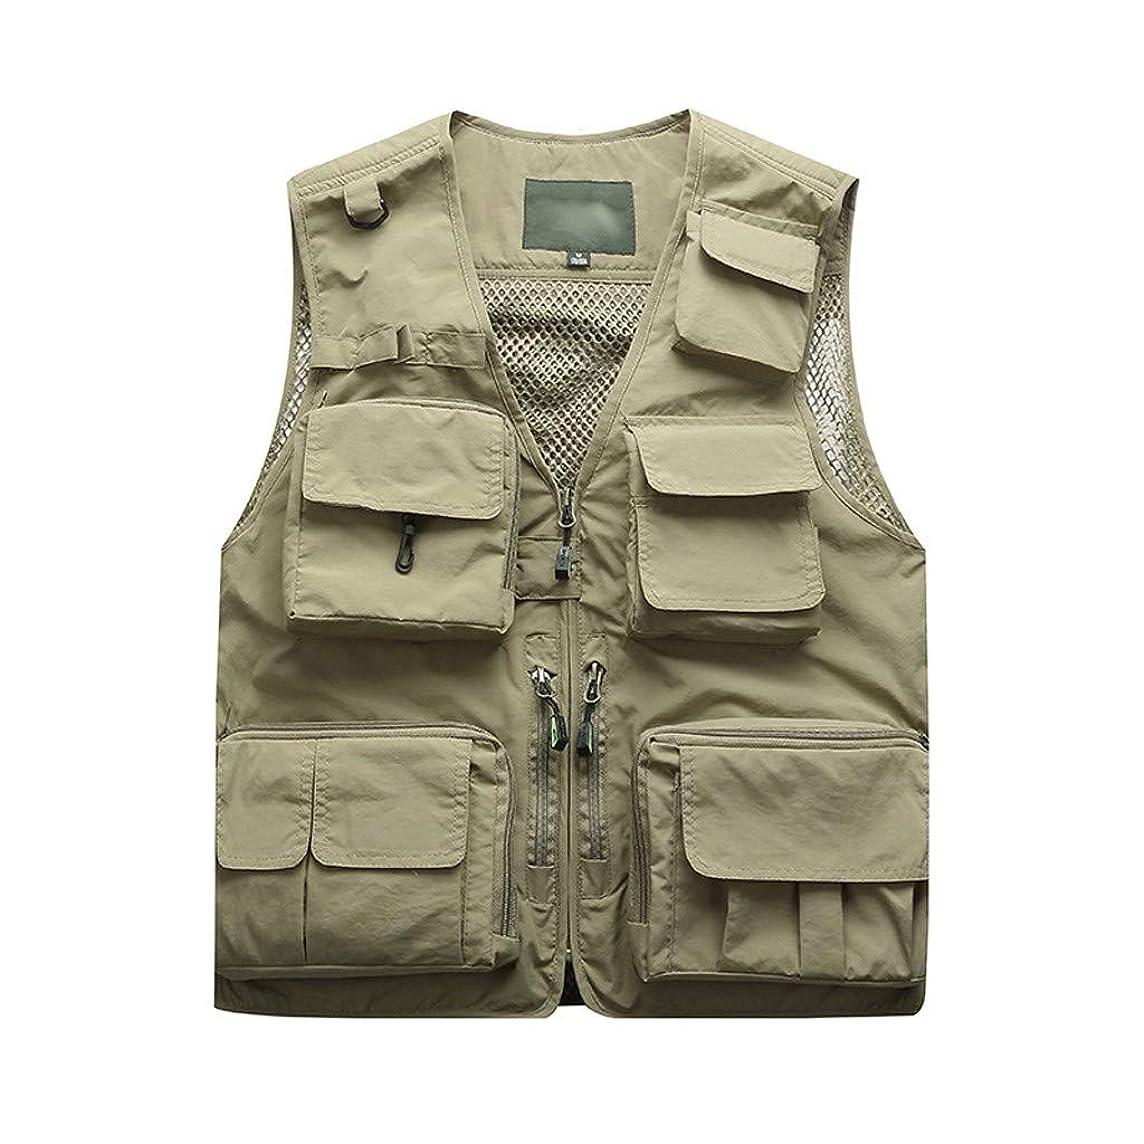 iHPH7 Men's Gym Tank Tops T-Shirt Vest Blouse #19052315